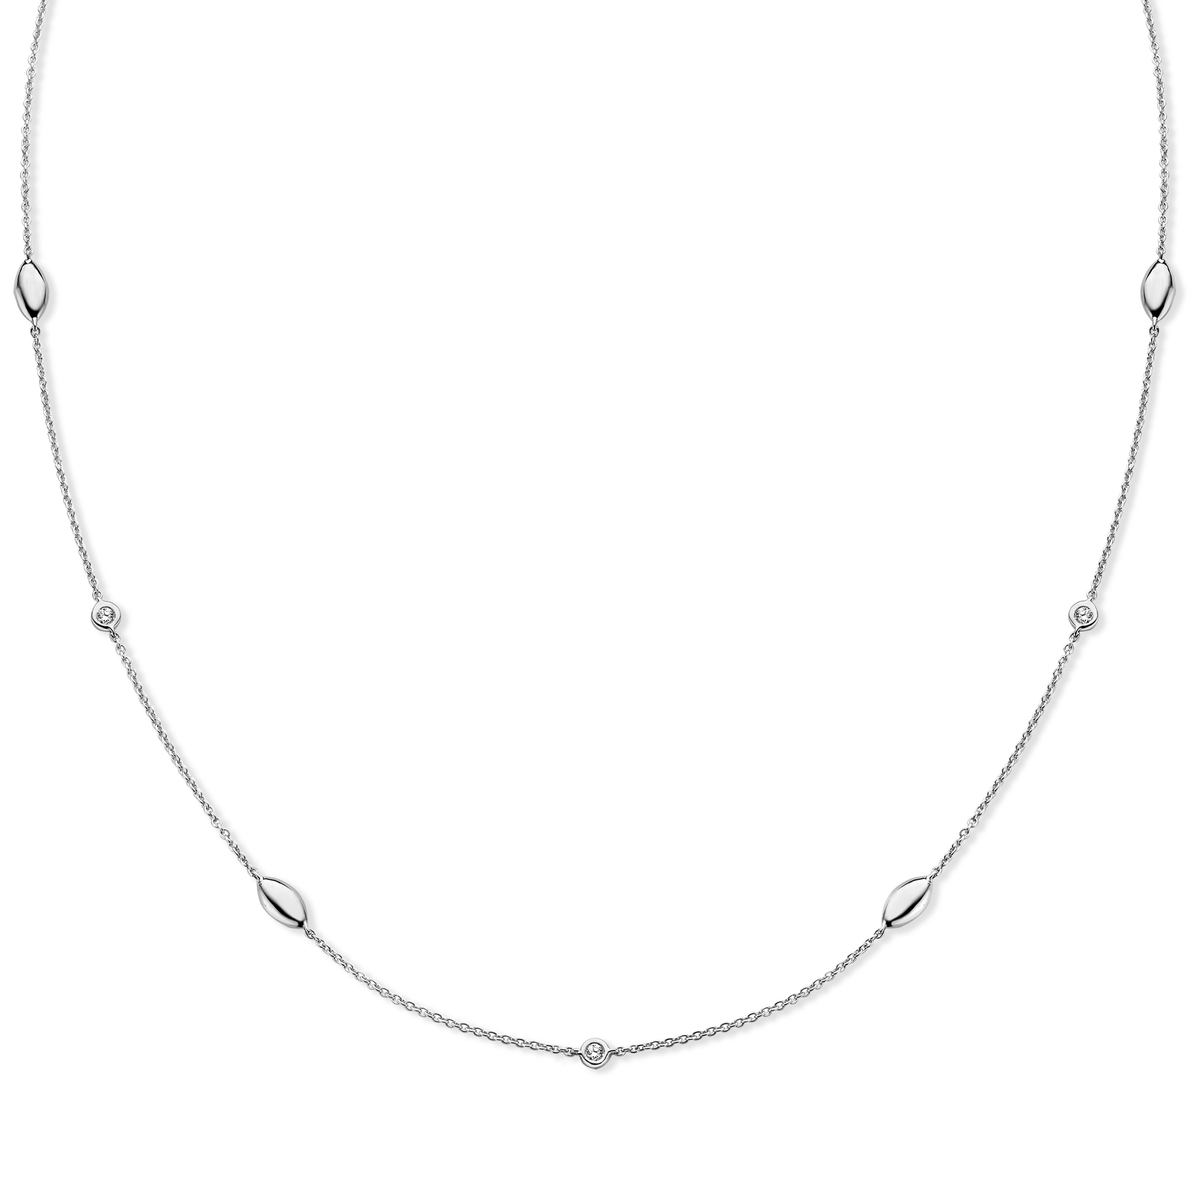 vulsini necklace in white gold